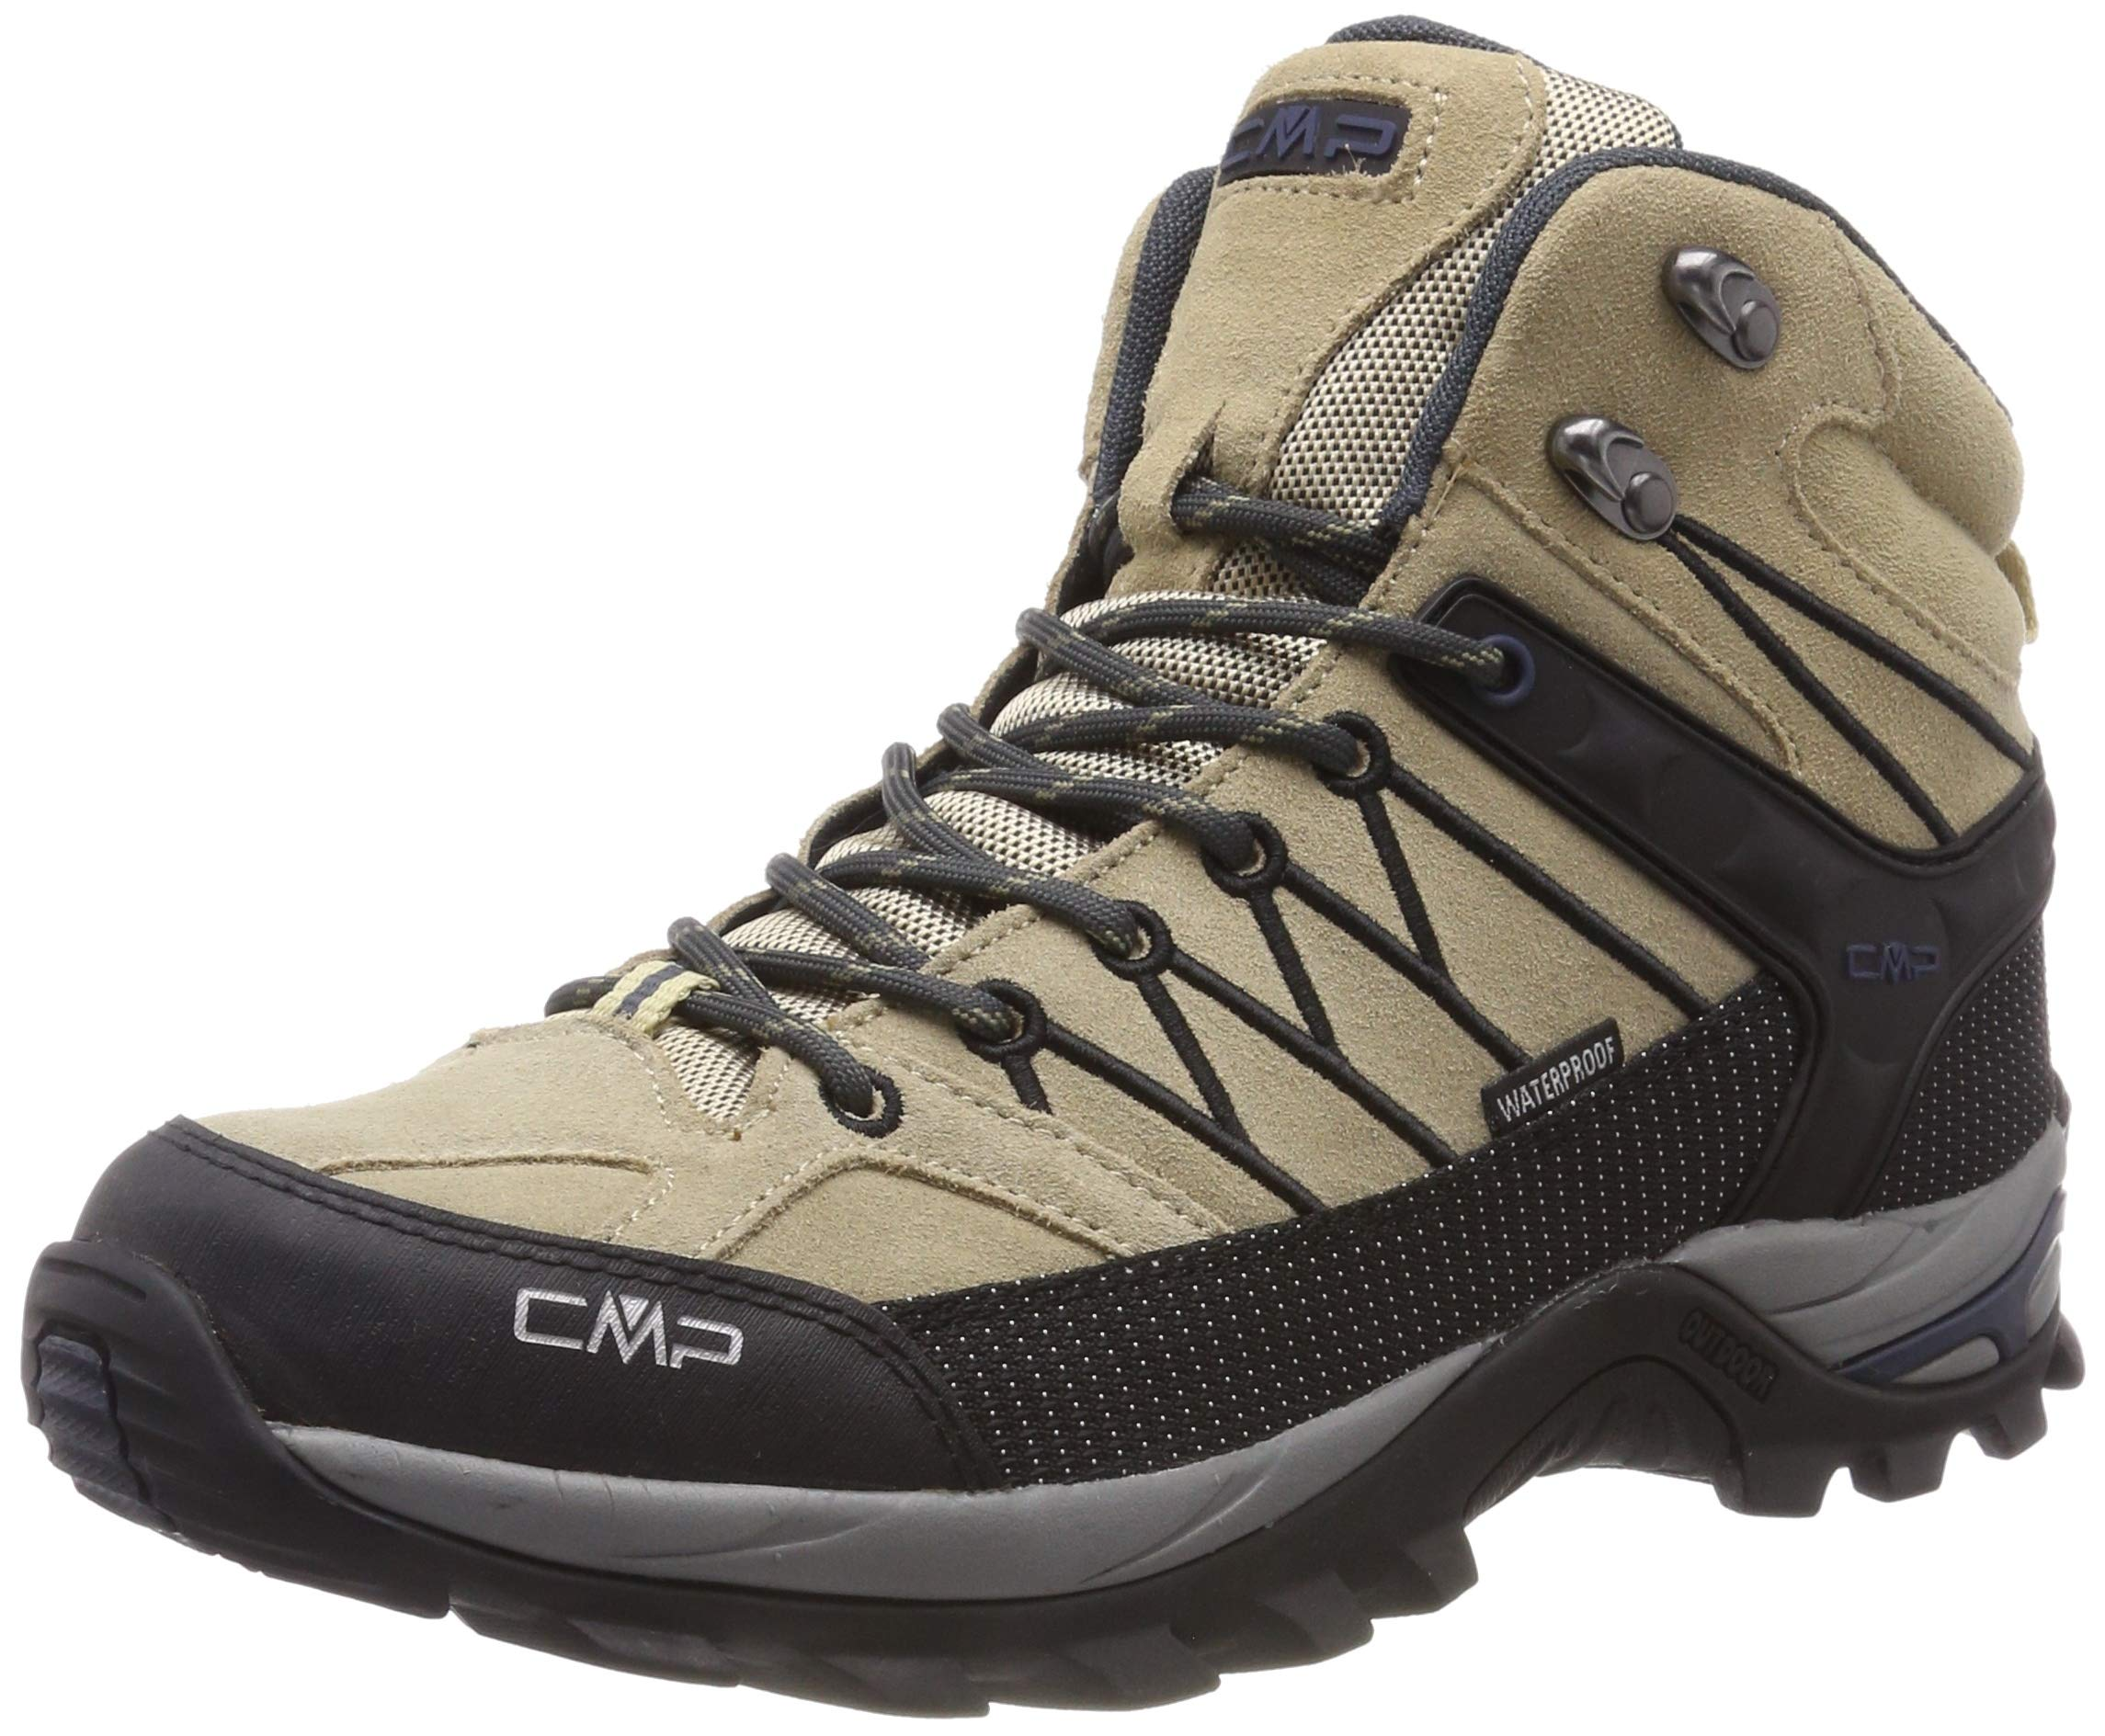 c7151c64ae94 I piu votati nella categoria Calzature da escursionismo   recensioni ...